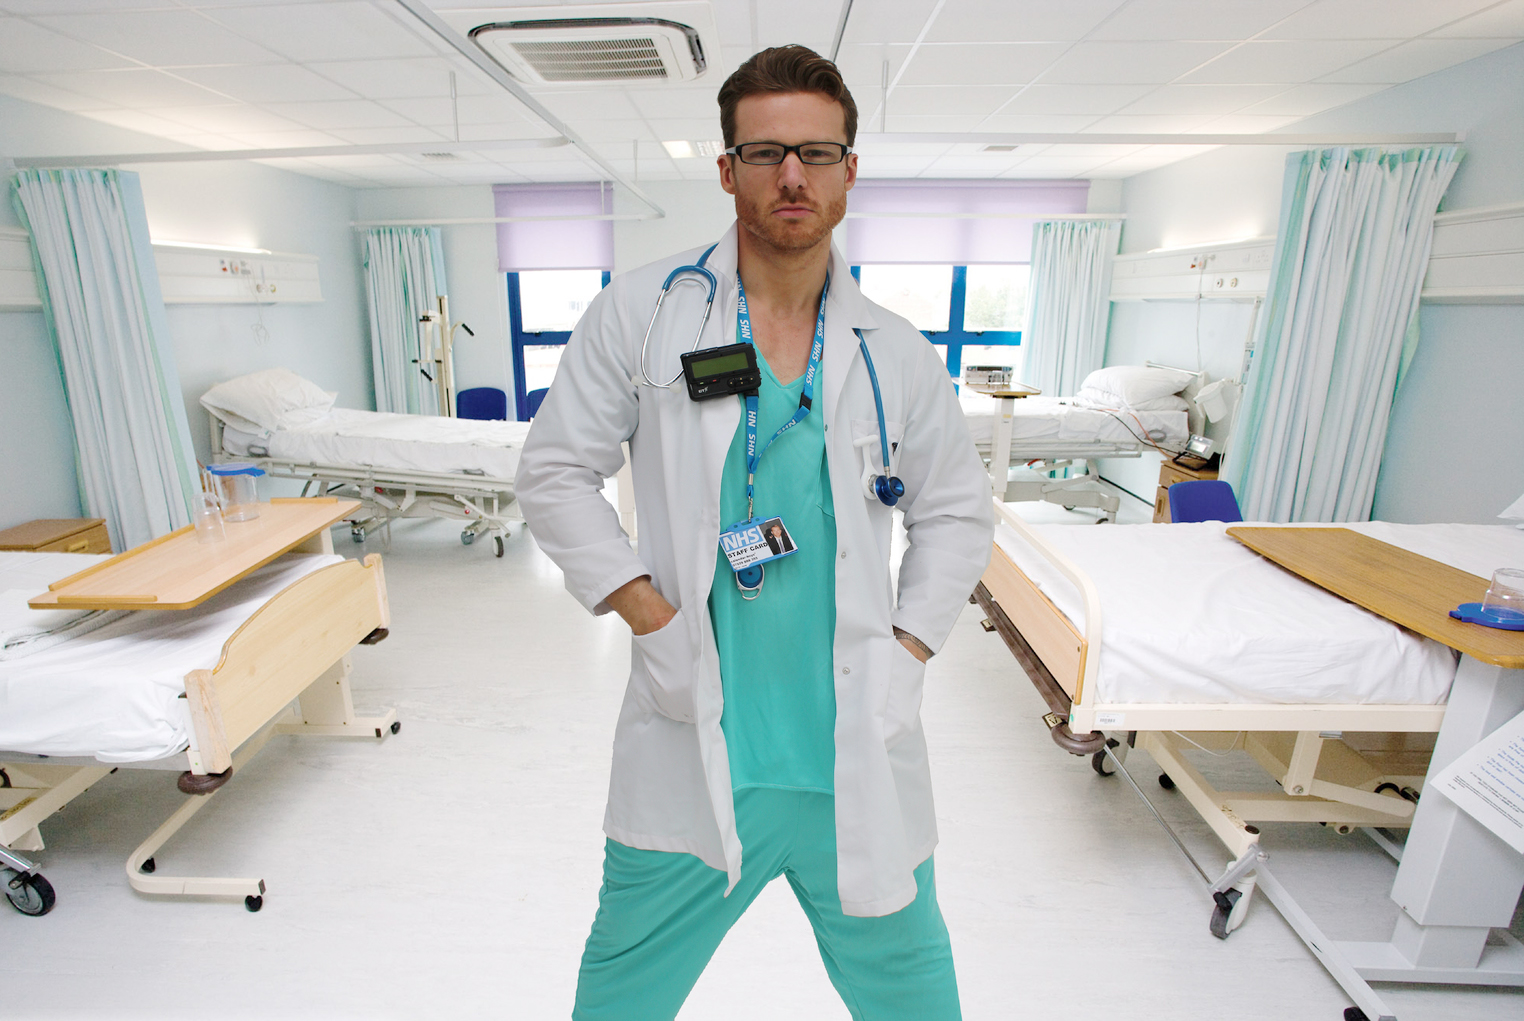 Stu Doctor